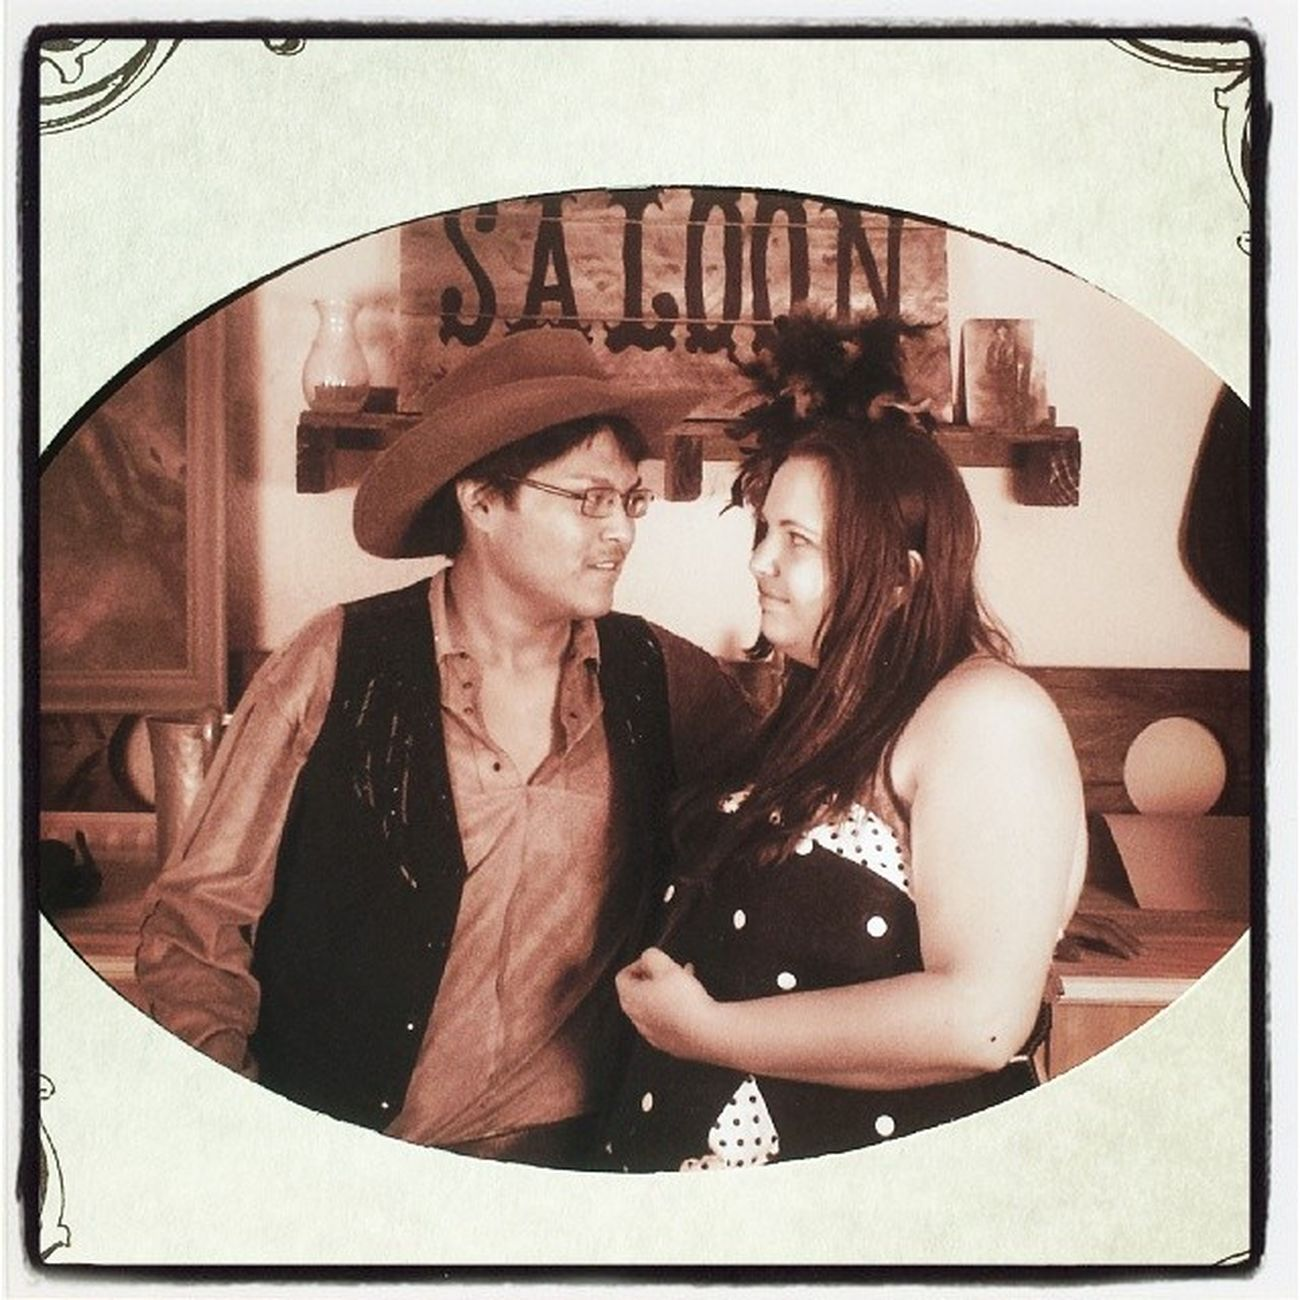 Saloon Cancan Couplesweekend Roadtrip cancan pistol bbgun shotgun feathers cowboy cowboys cowboyhat bar saloongirls admirer navajo native nativeamerican cheyenne apache sioux oldwest wildwest whitegirl